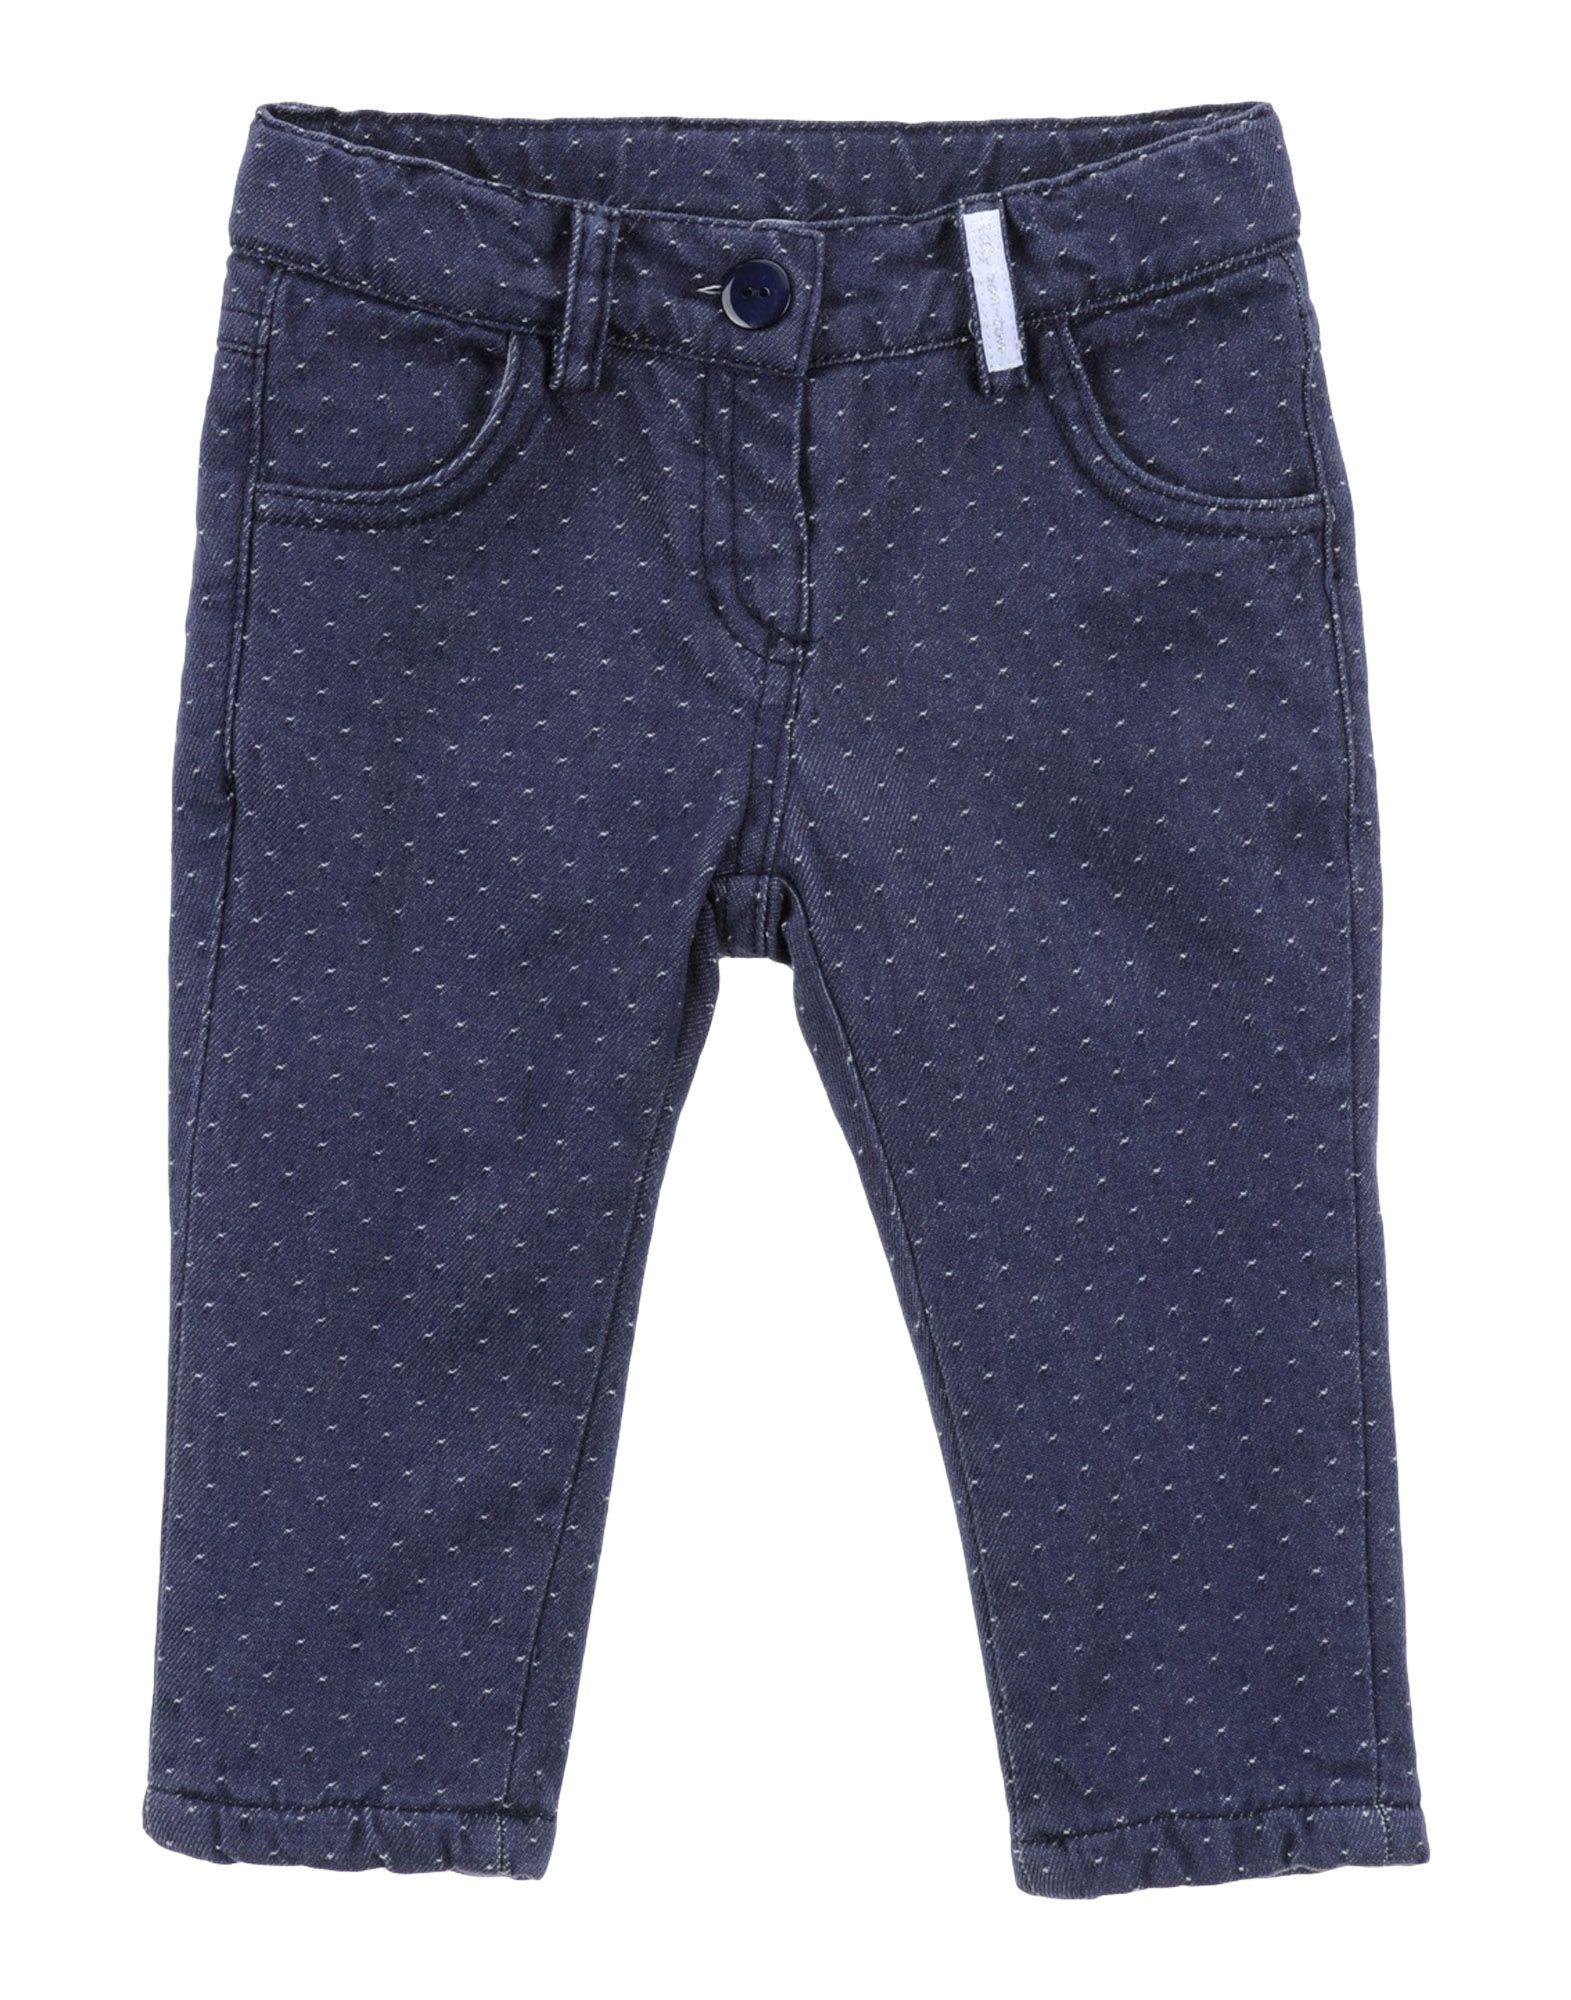 все цены на LEO E LILLY BON TON Повседневные брюки онлайн